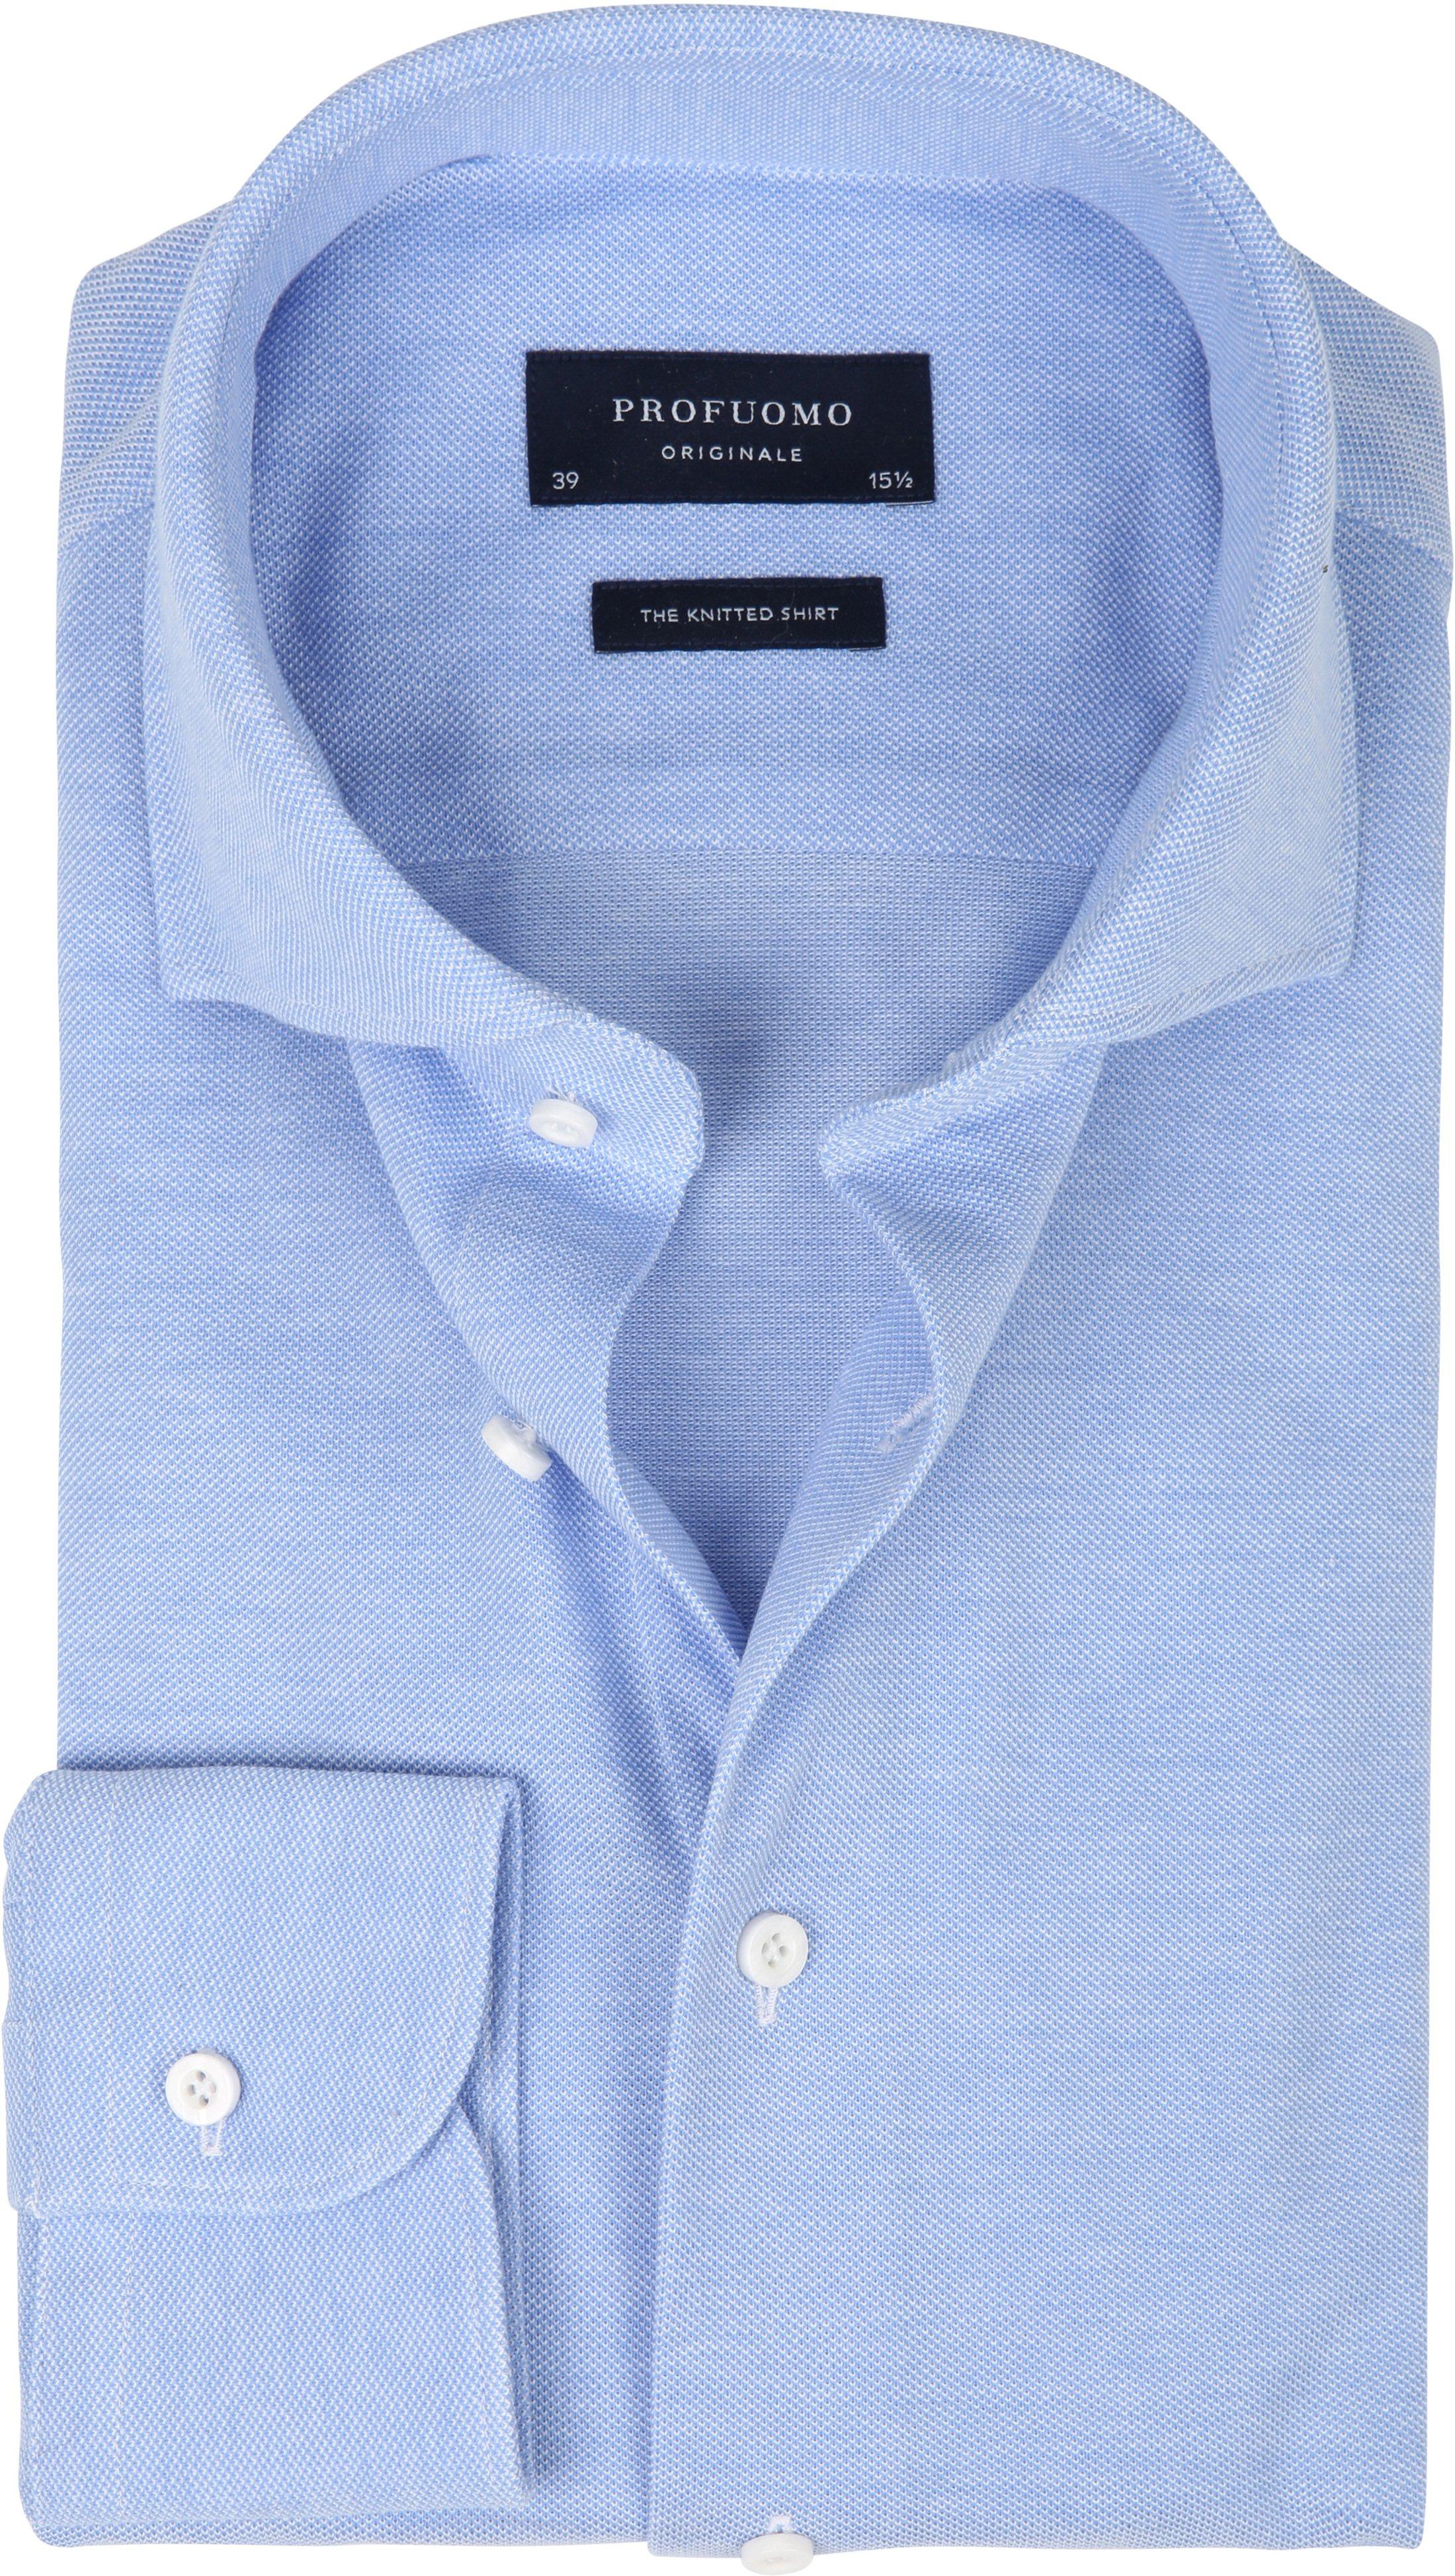 Profuomo Hemd Knitted Slim Fit Blau Foto 0